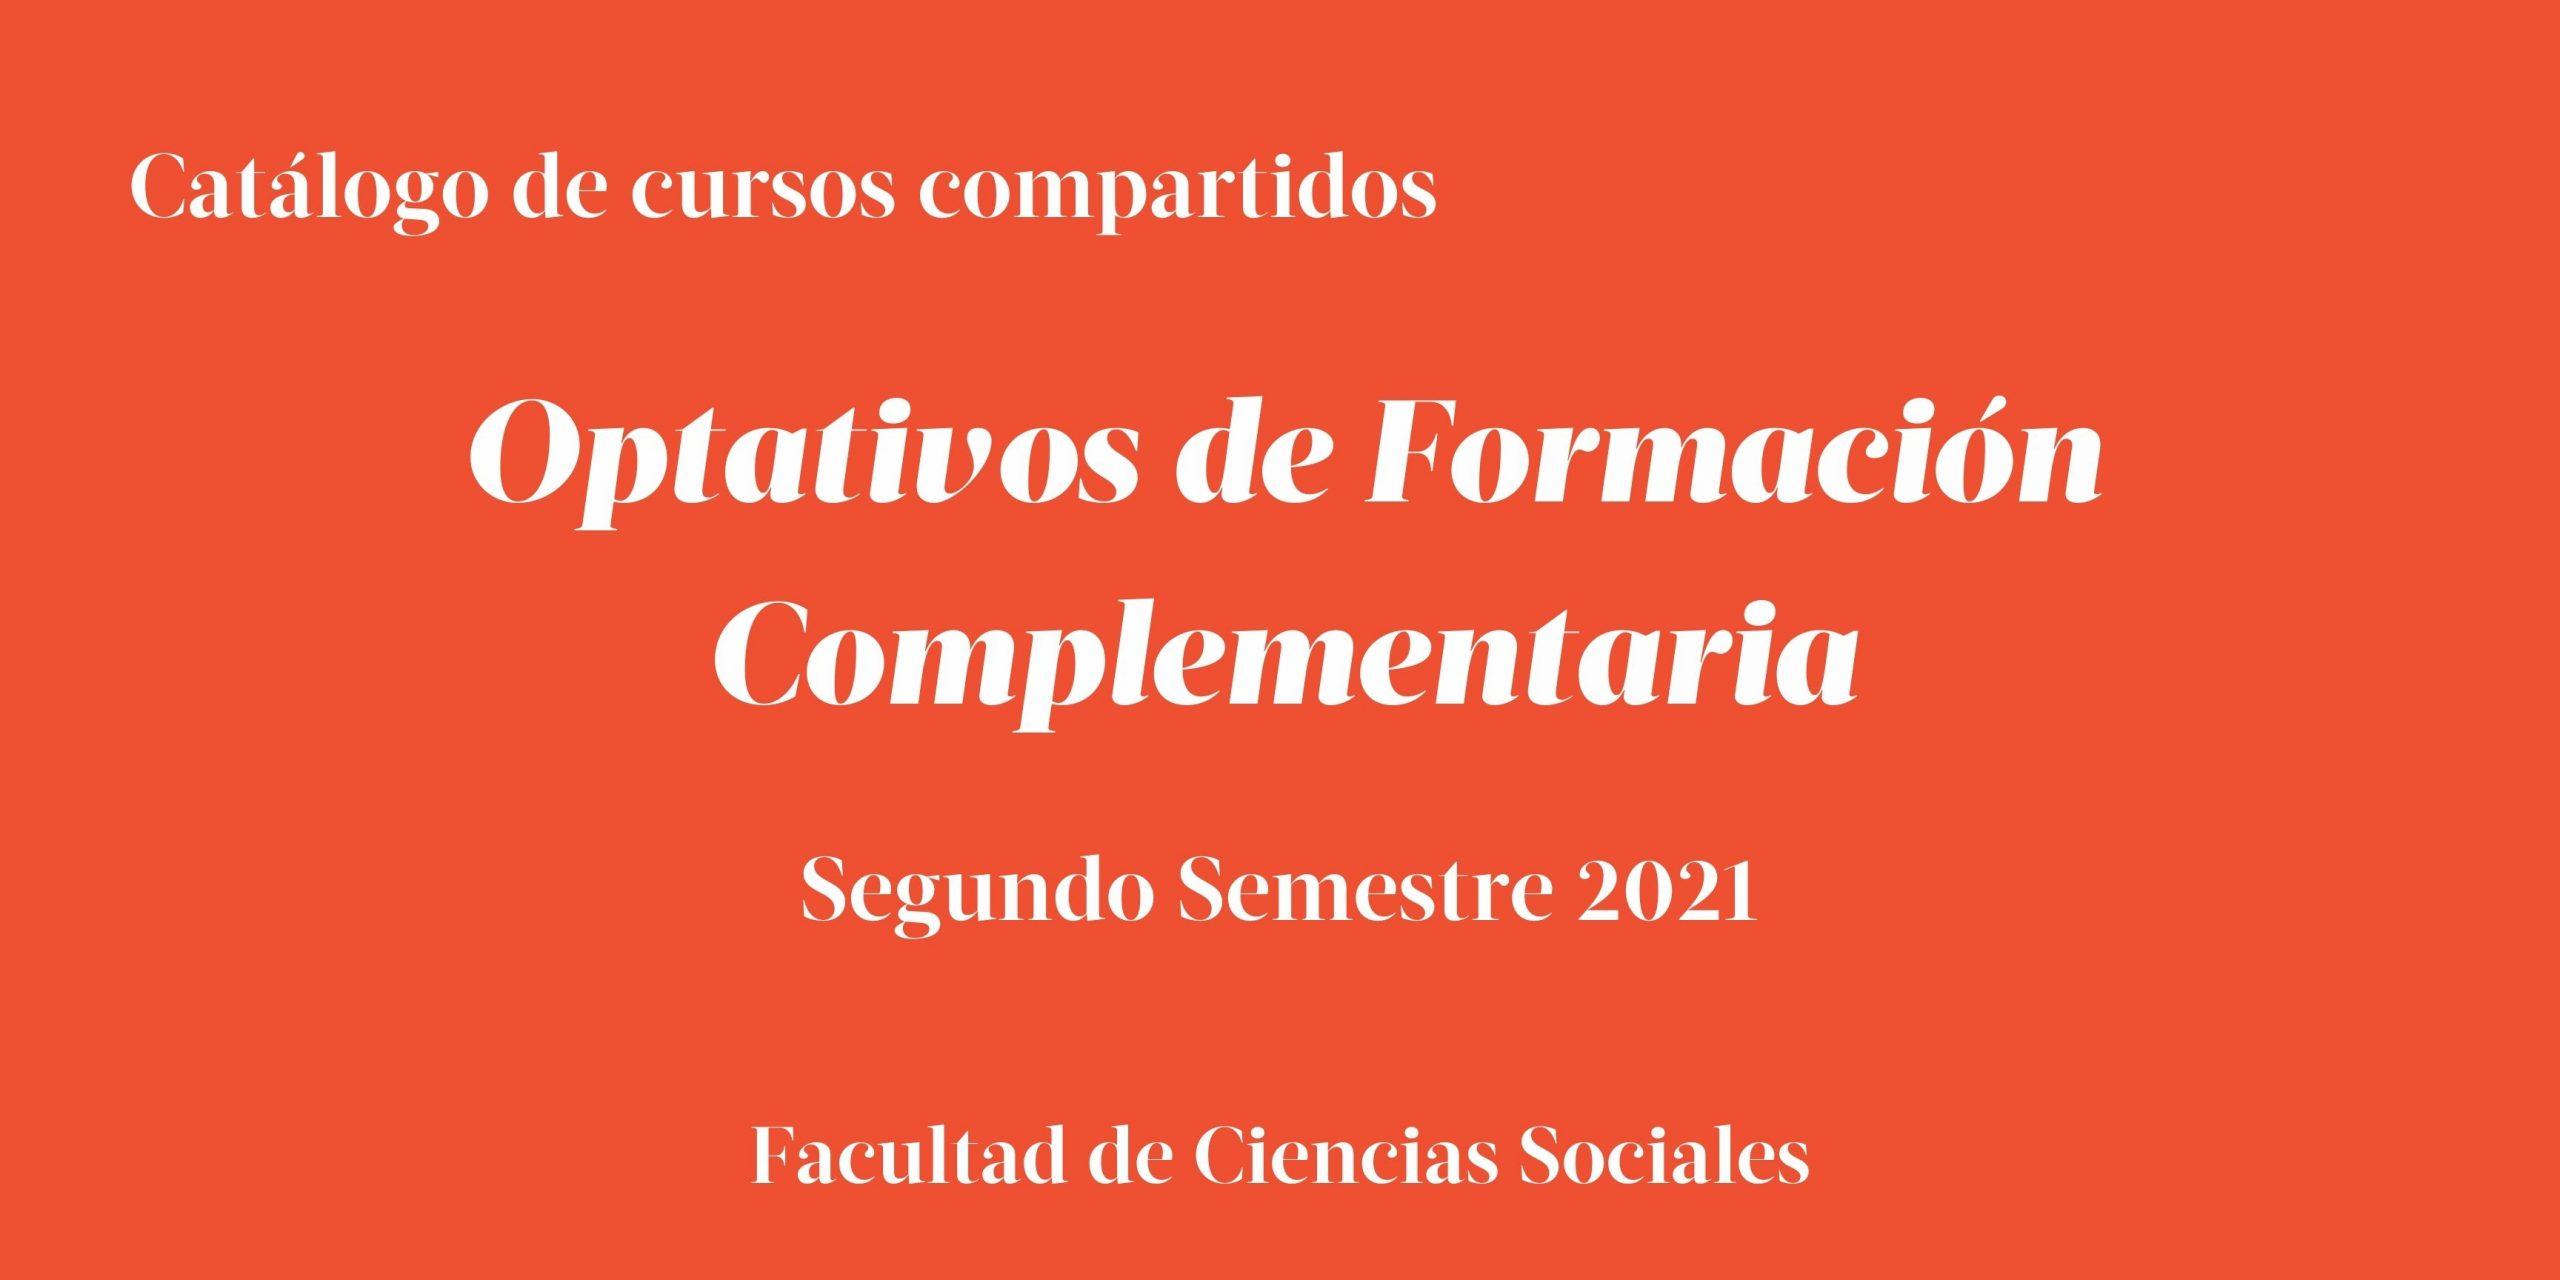 Catálogo de cursos OFC compartidos para estudiantes de FACSO   Segundo Semestre 2021